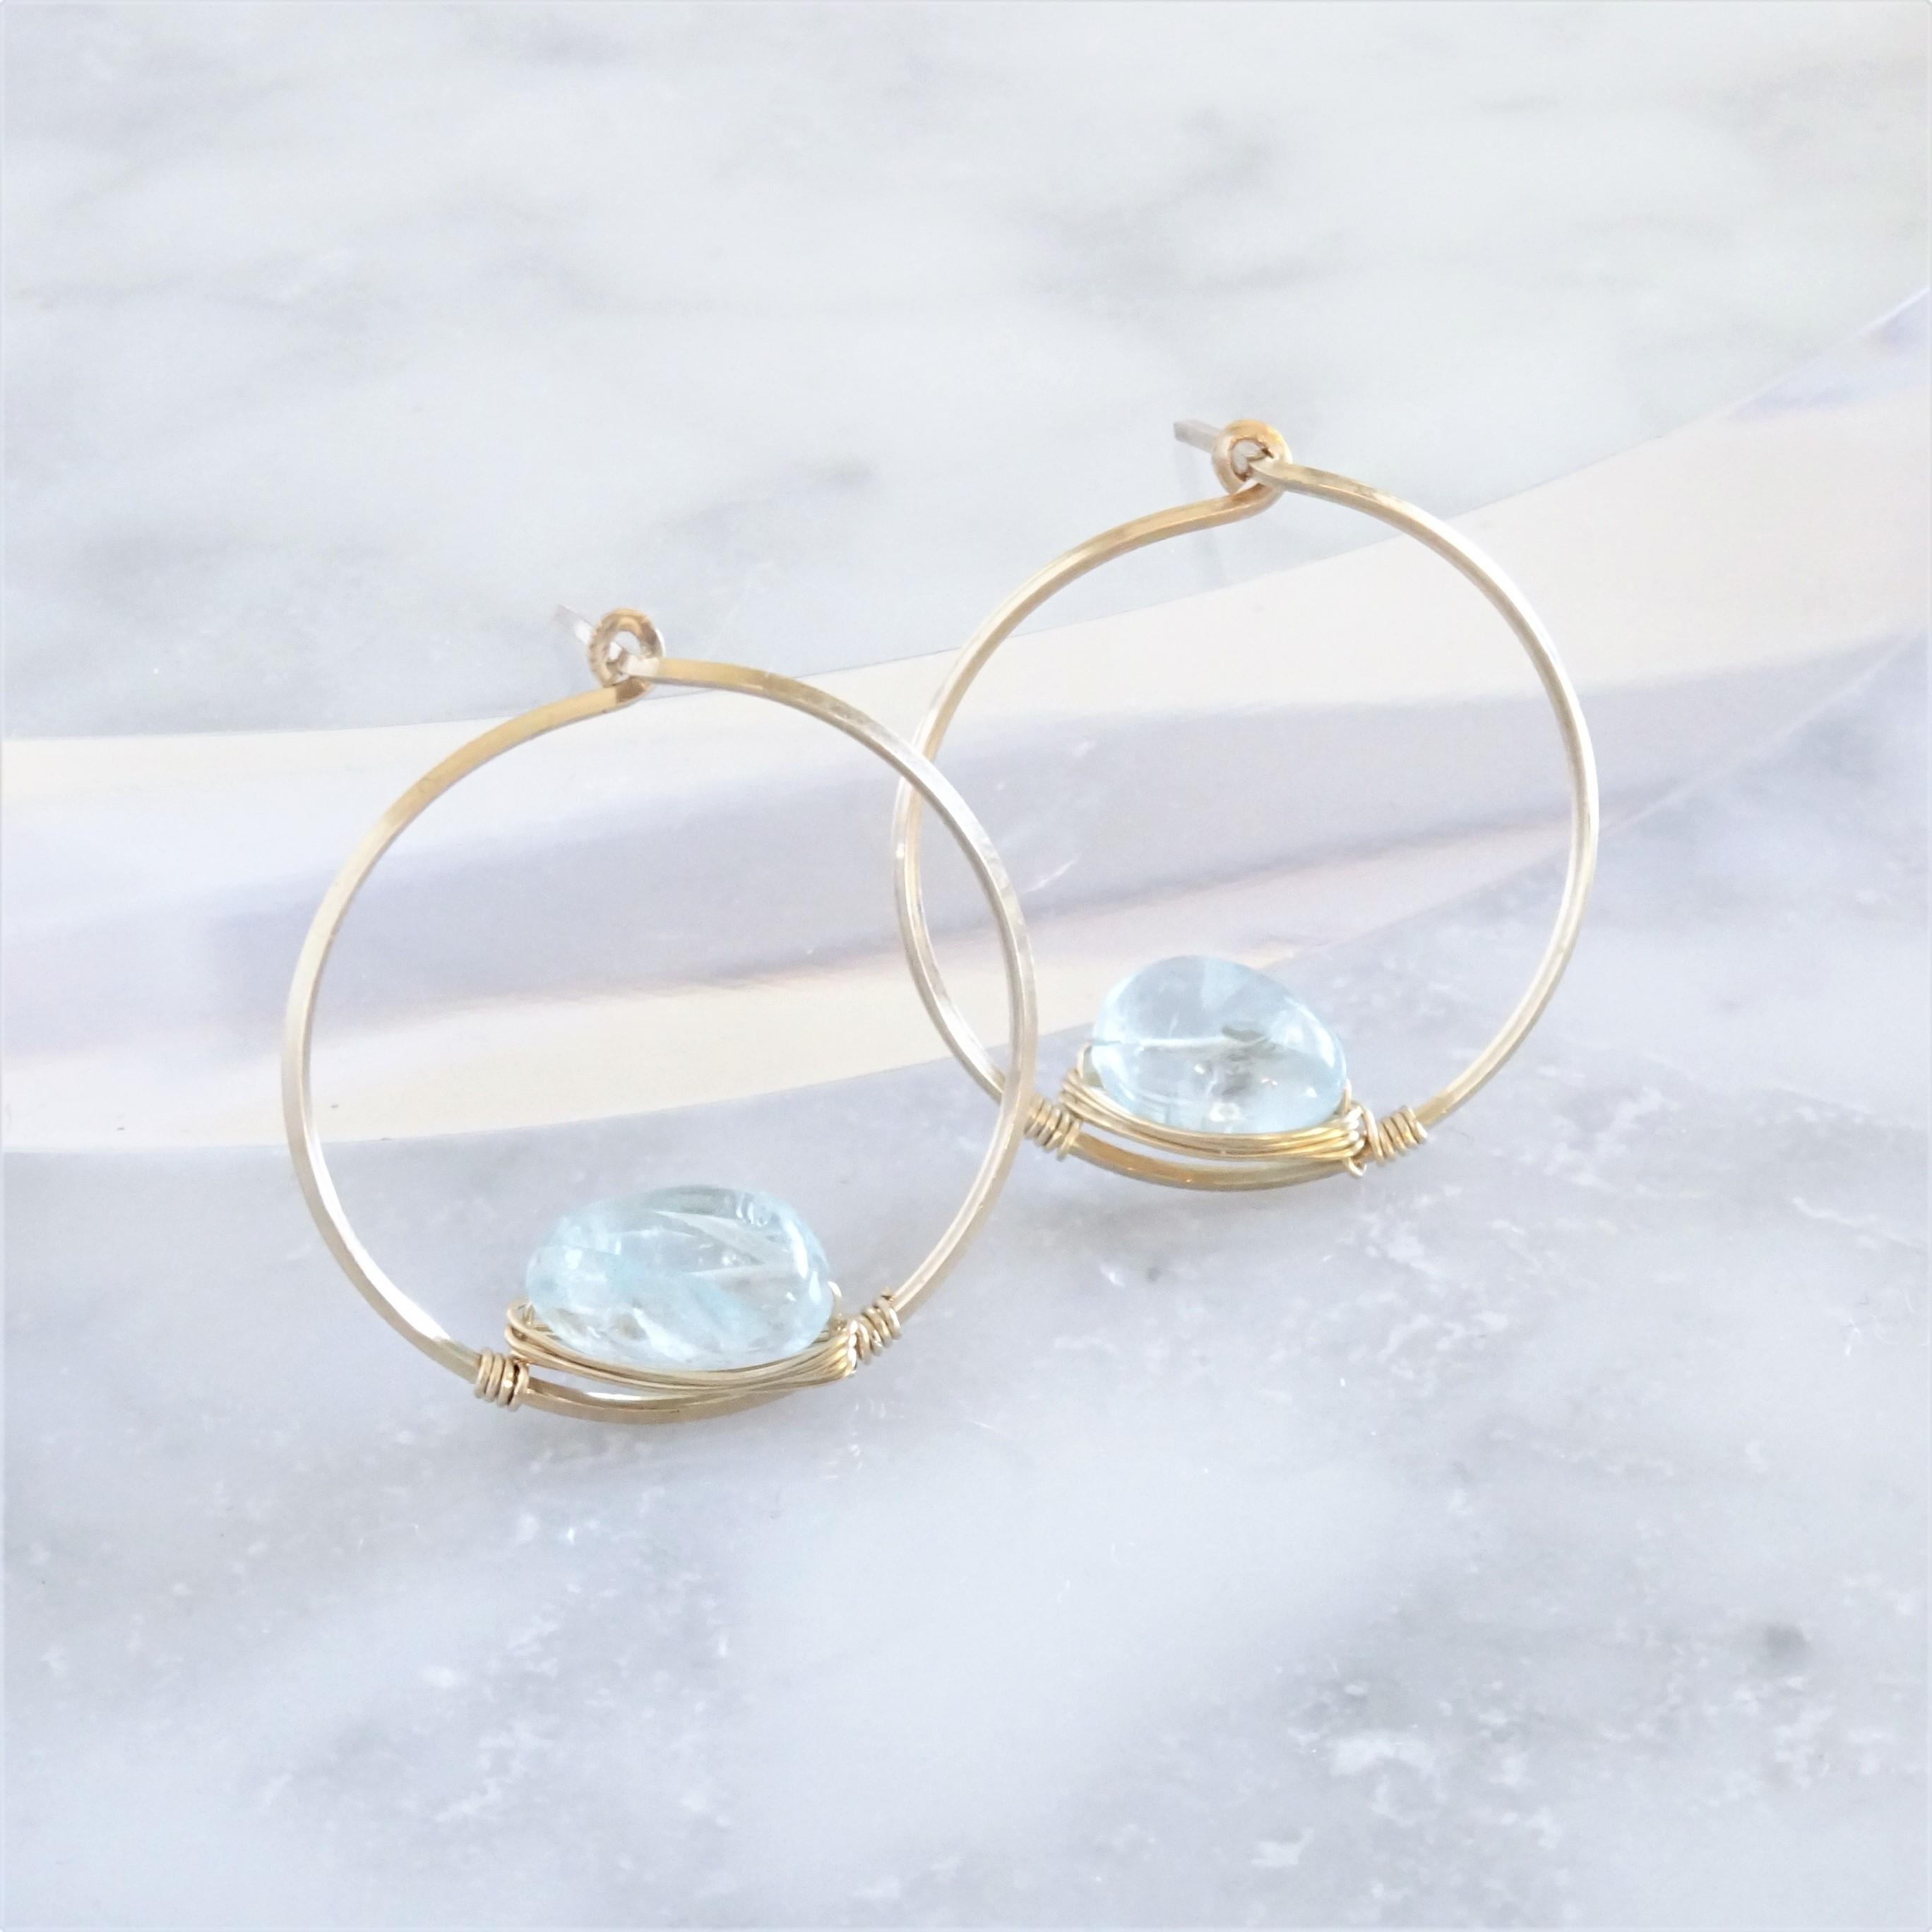 14kgf*宝石質AAA Aquamarine pierced earring / earring